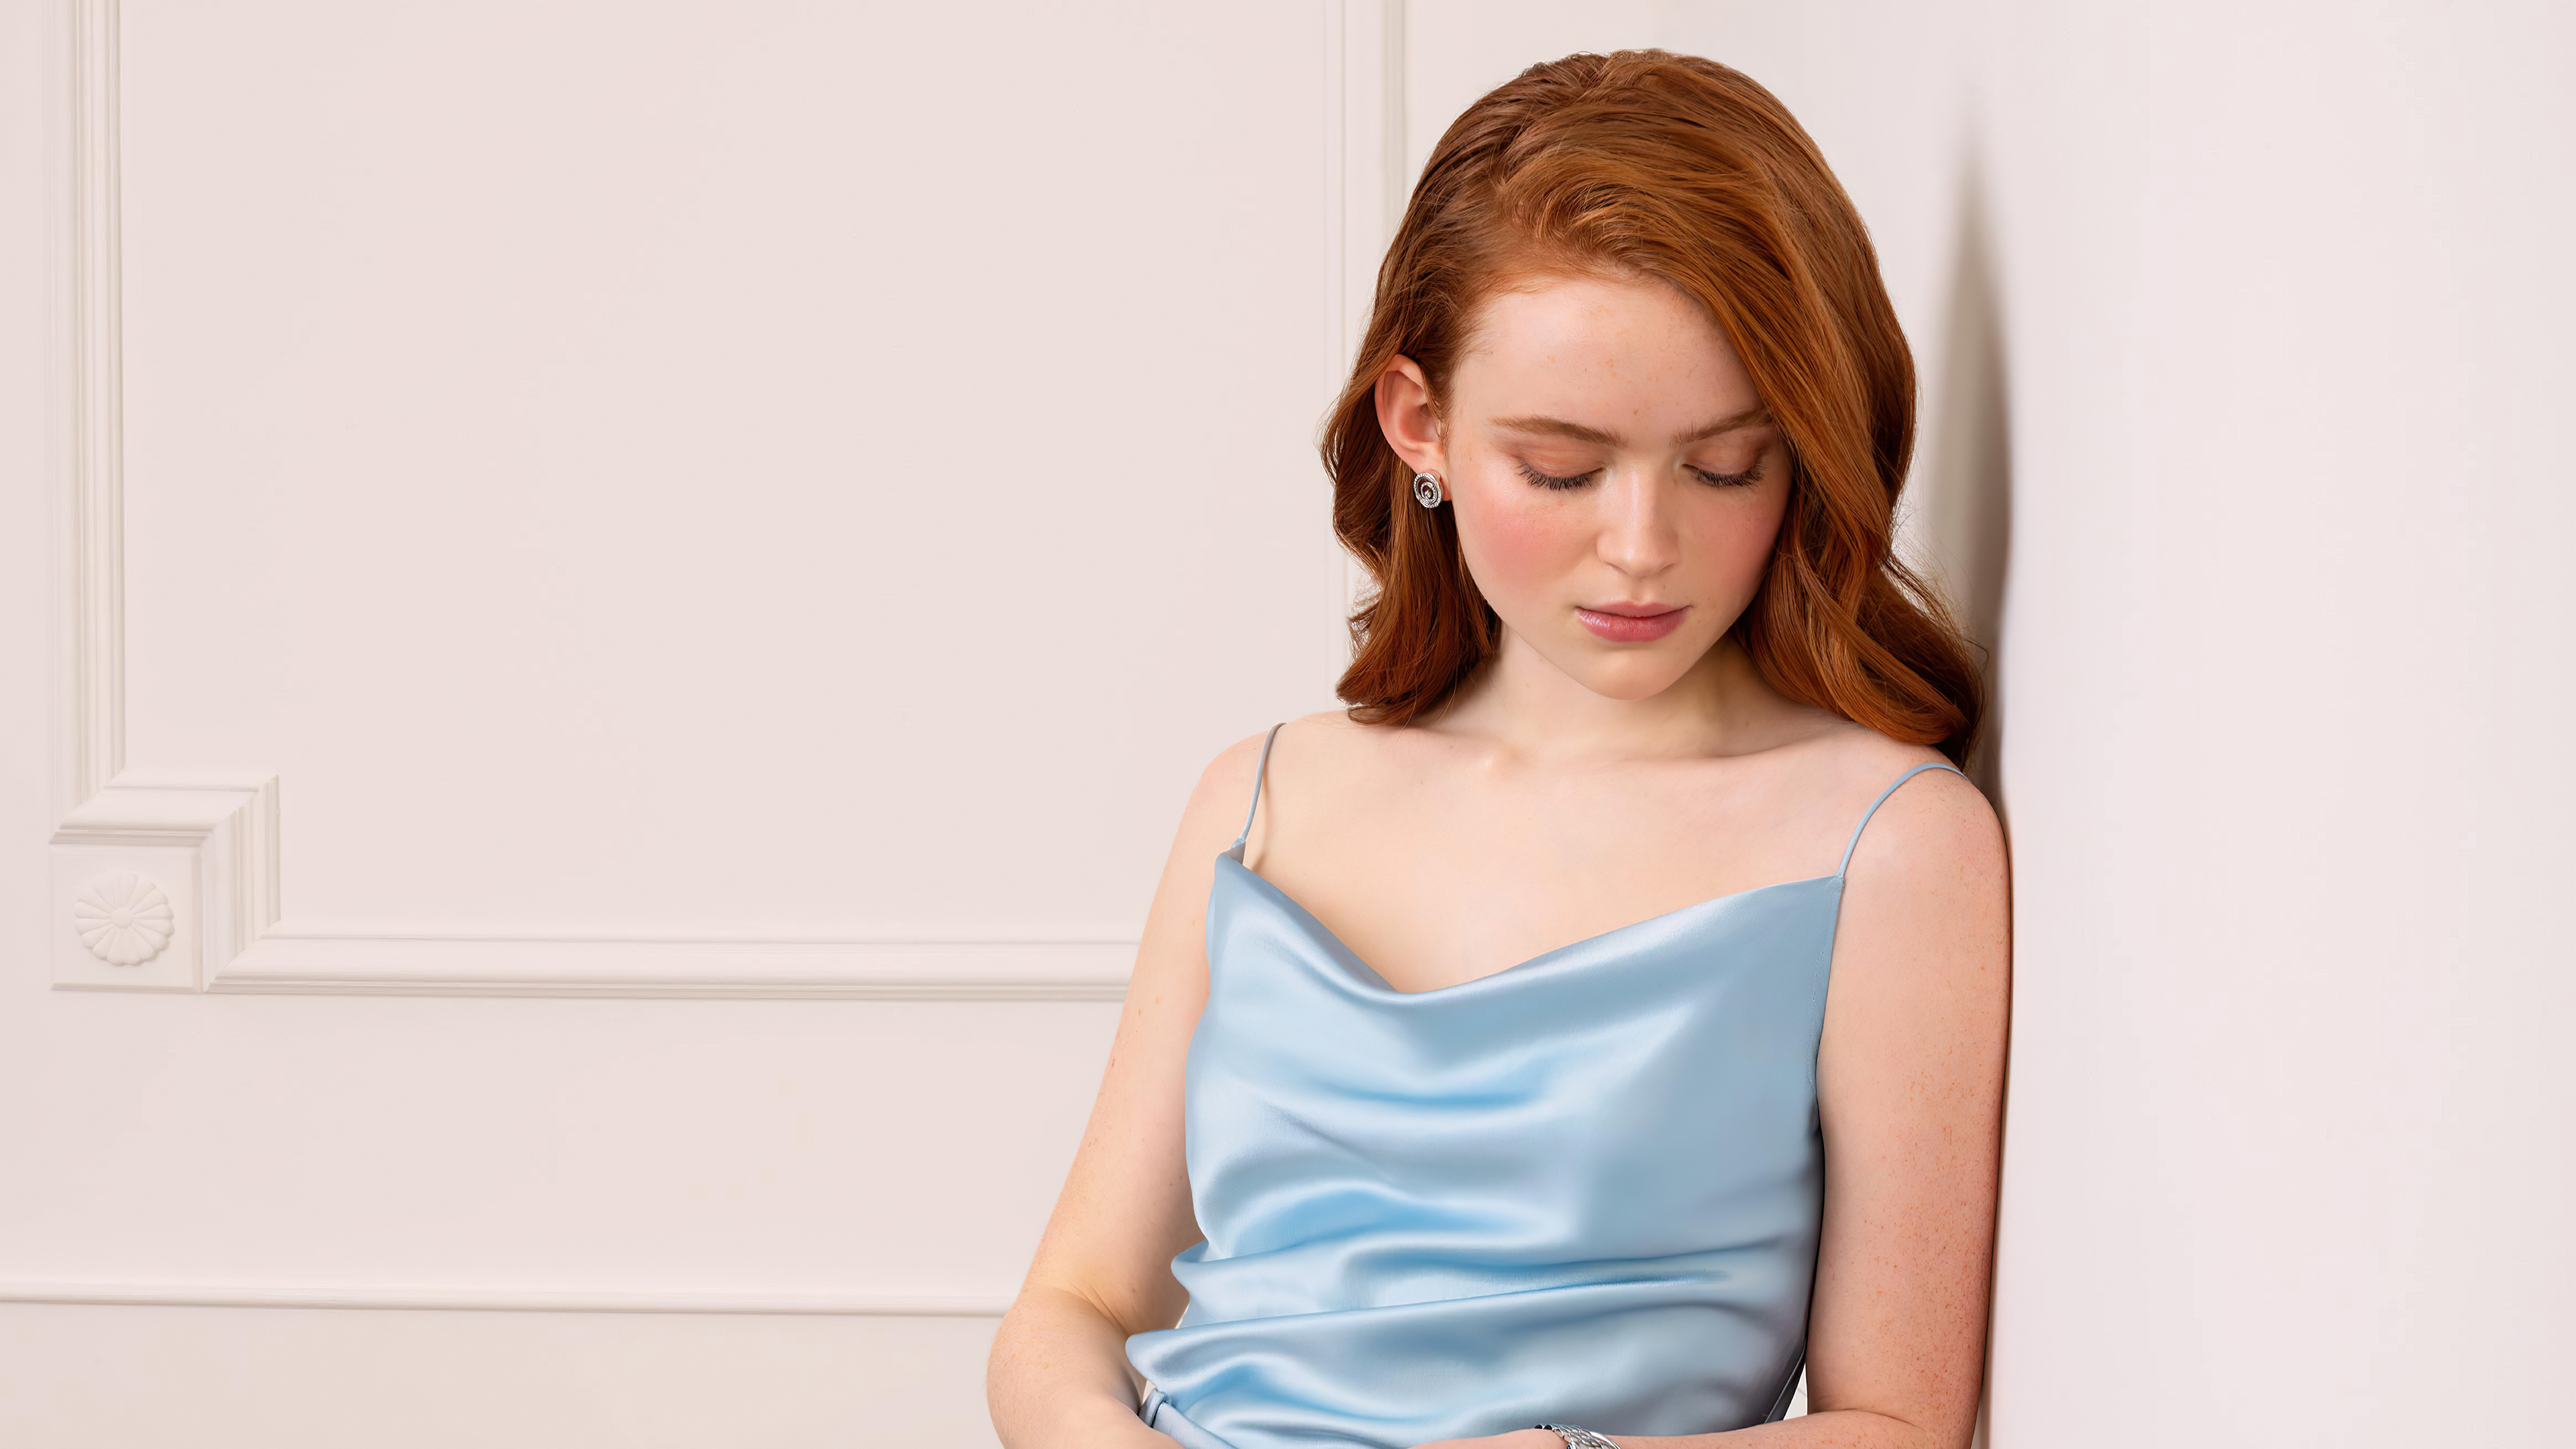 Wallpaper Sadie Sink blue dress